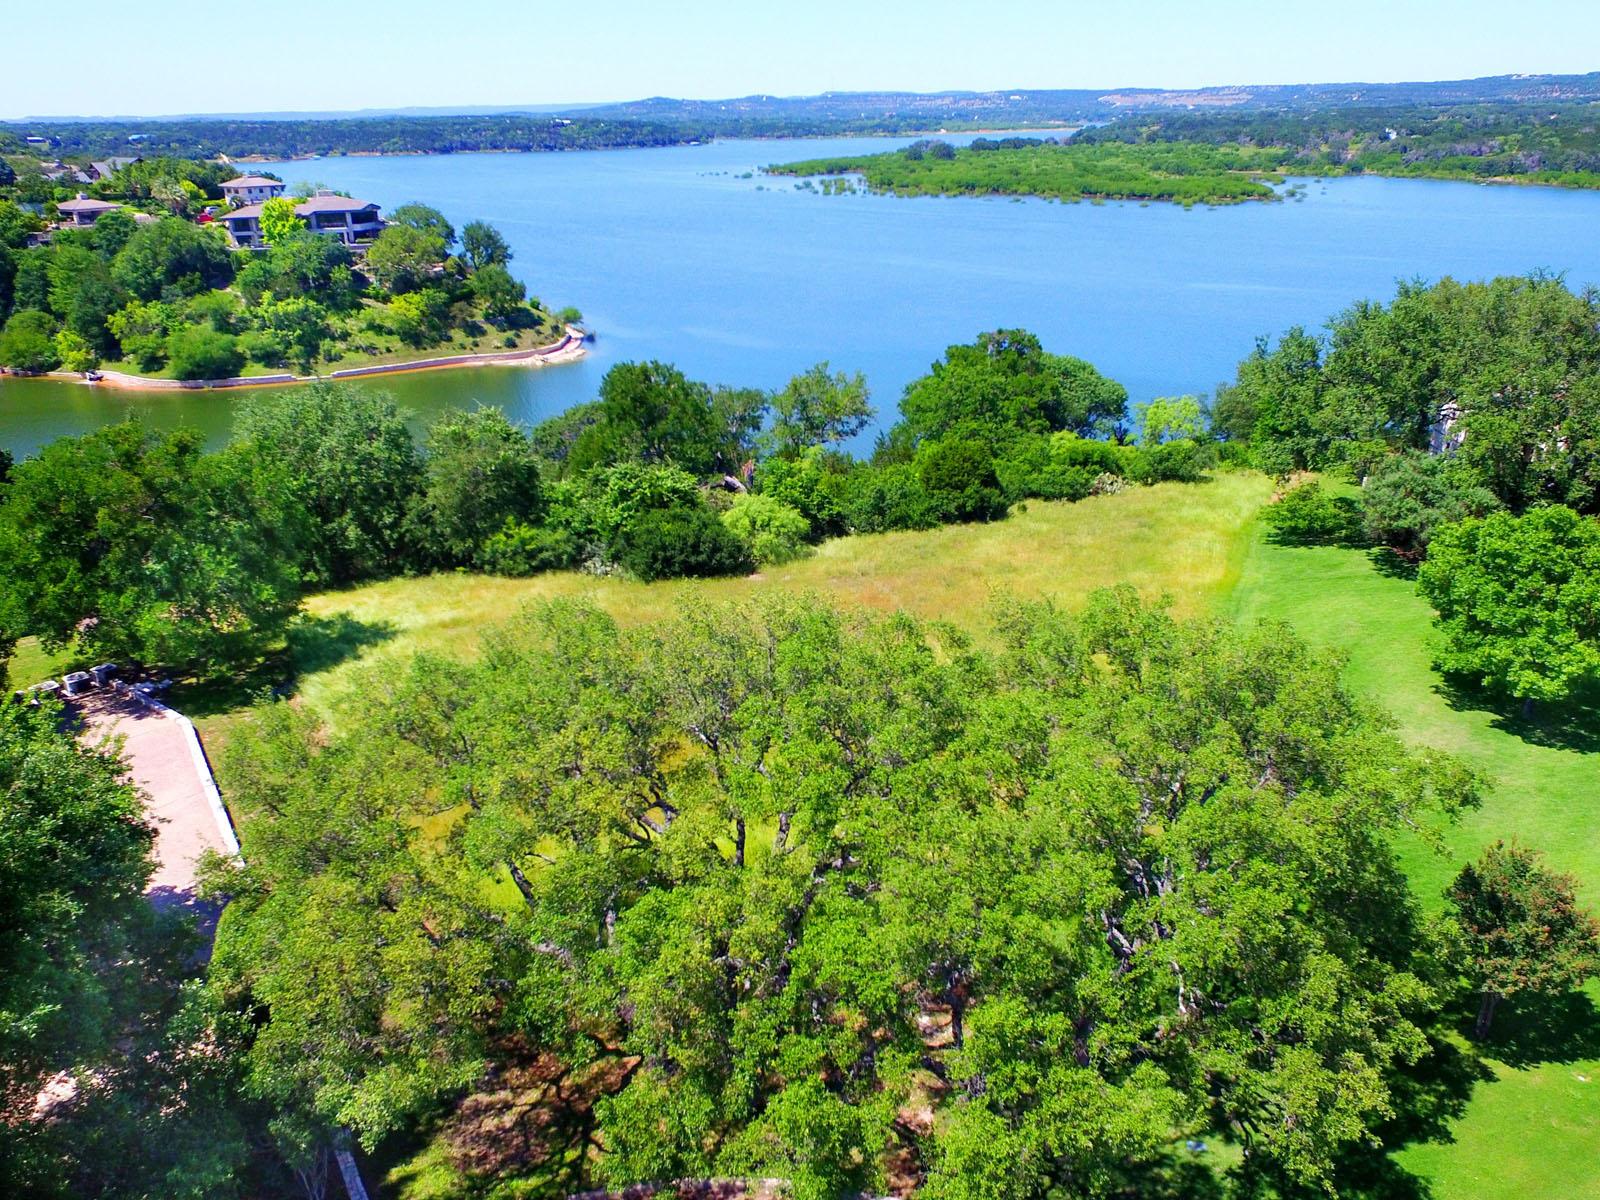 Terreno por un Venta en Lake Travis Waterfront 2512 Sailpoint Dr Spicewood, Texas 78669 Estados Unidos